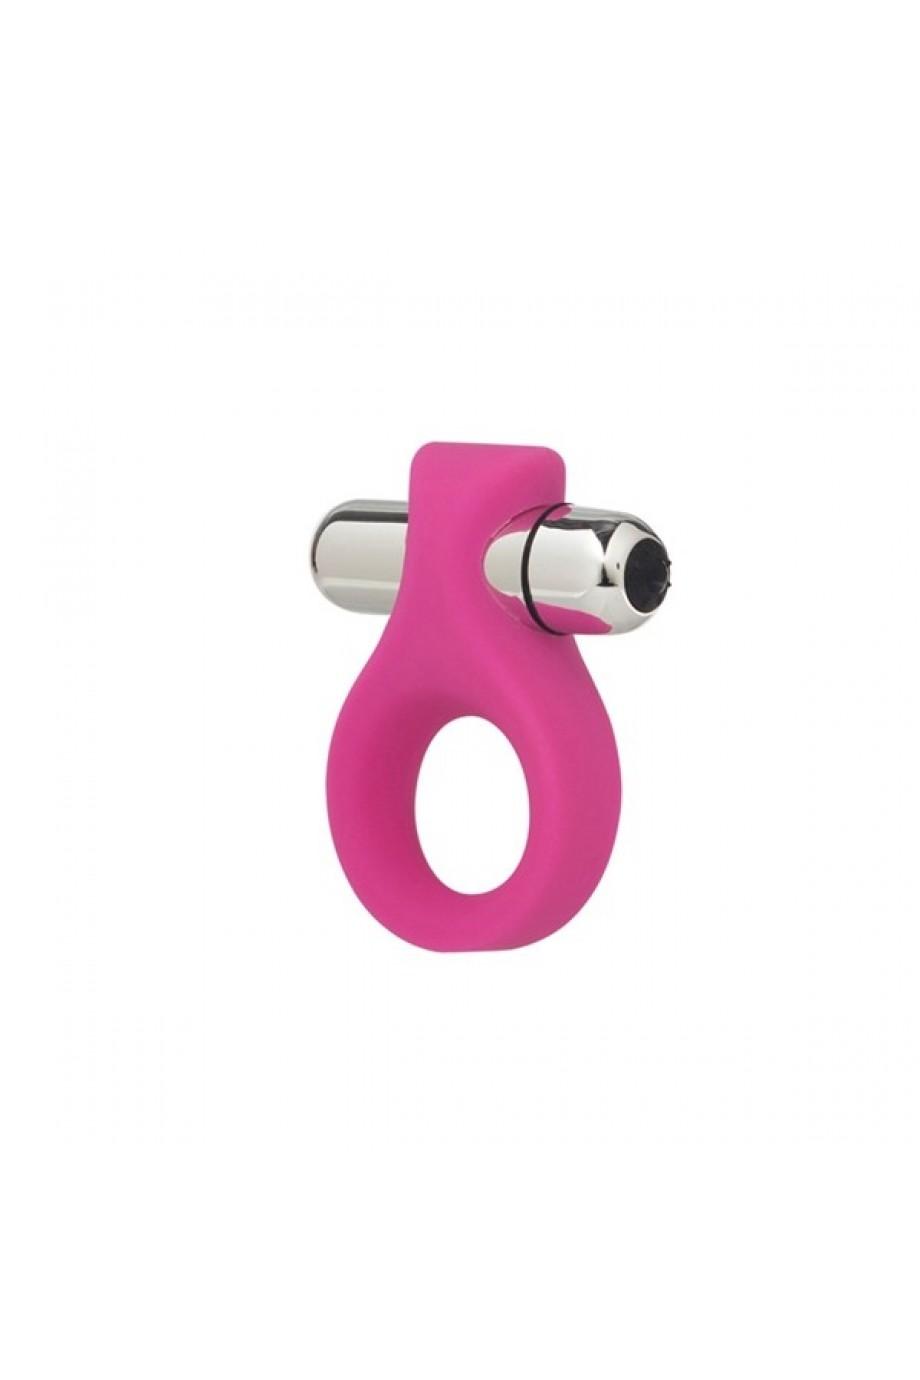 Вибронасадка Embrace Lovers Ring - Pink розовая